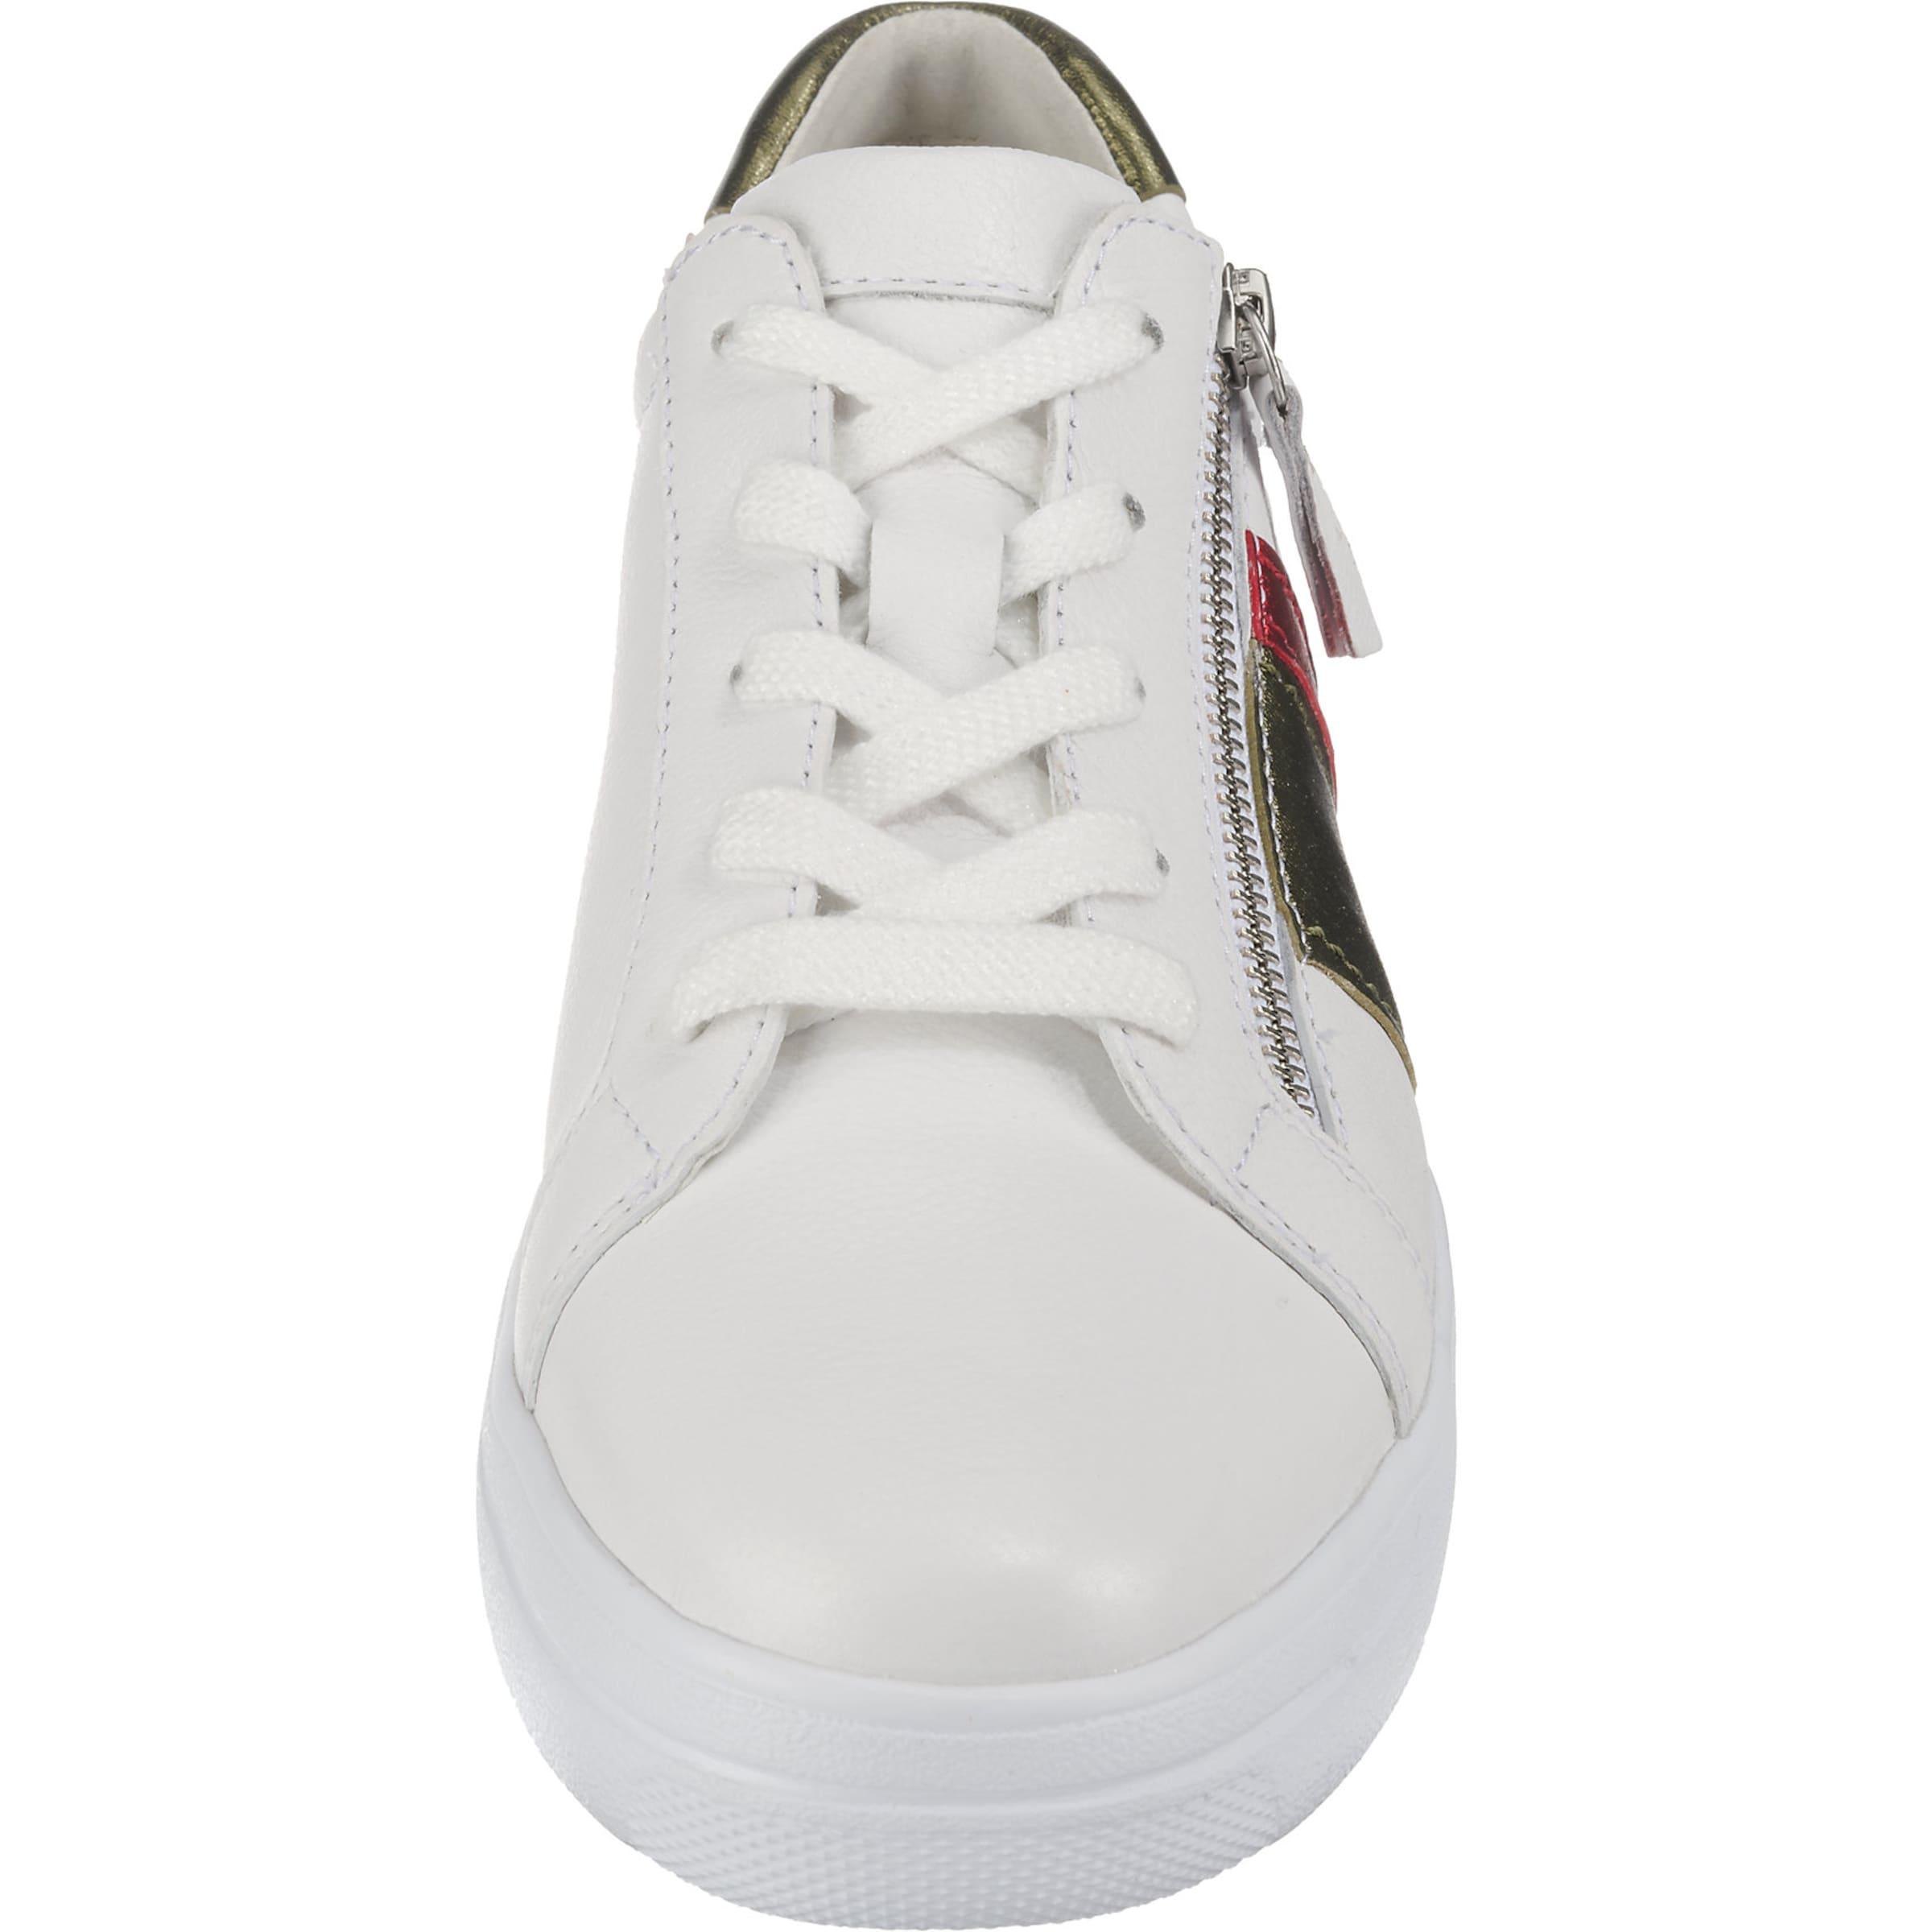 In Weiß In Sneaker KhakiFeuerrot Gabor Sneaker In Gabor Gabor Sneaker KhakiFeuerrot Weiß wPZ80kXNnO